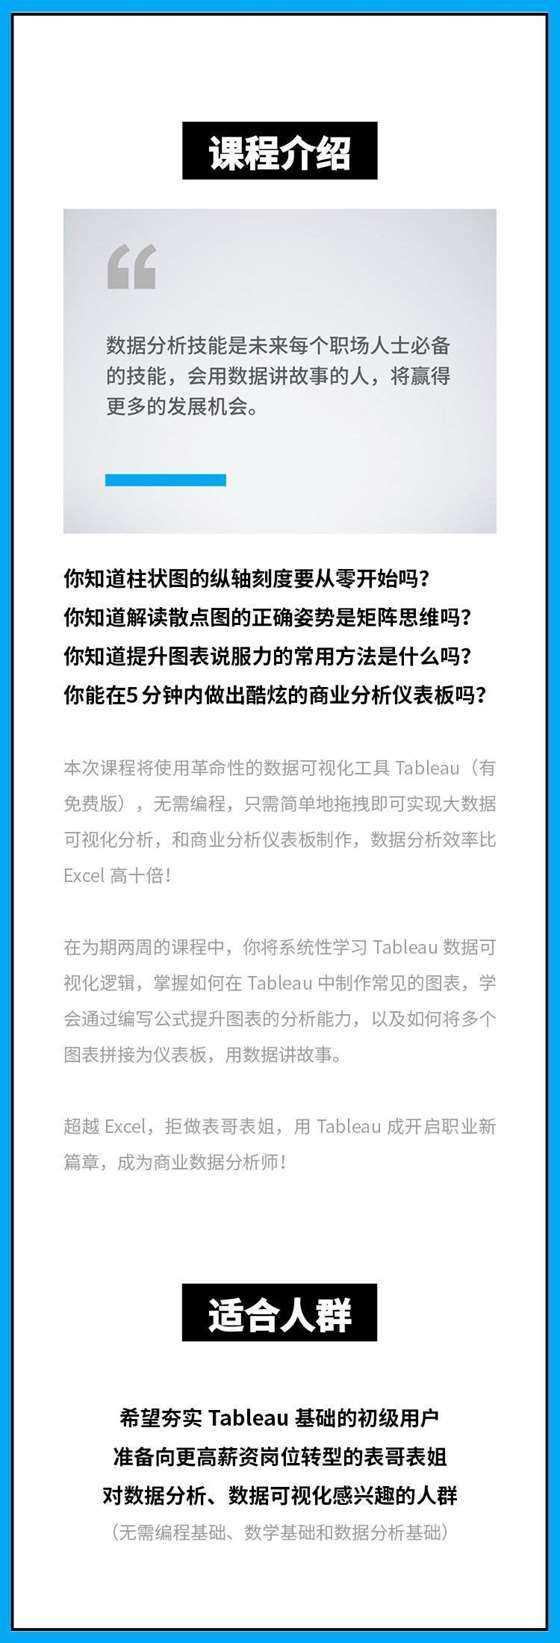 http://www.huodongxing.com/file/20170905/1692804578949/823233786559399.jpg